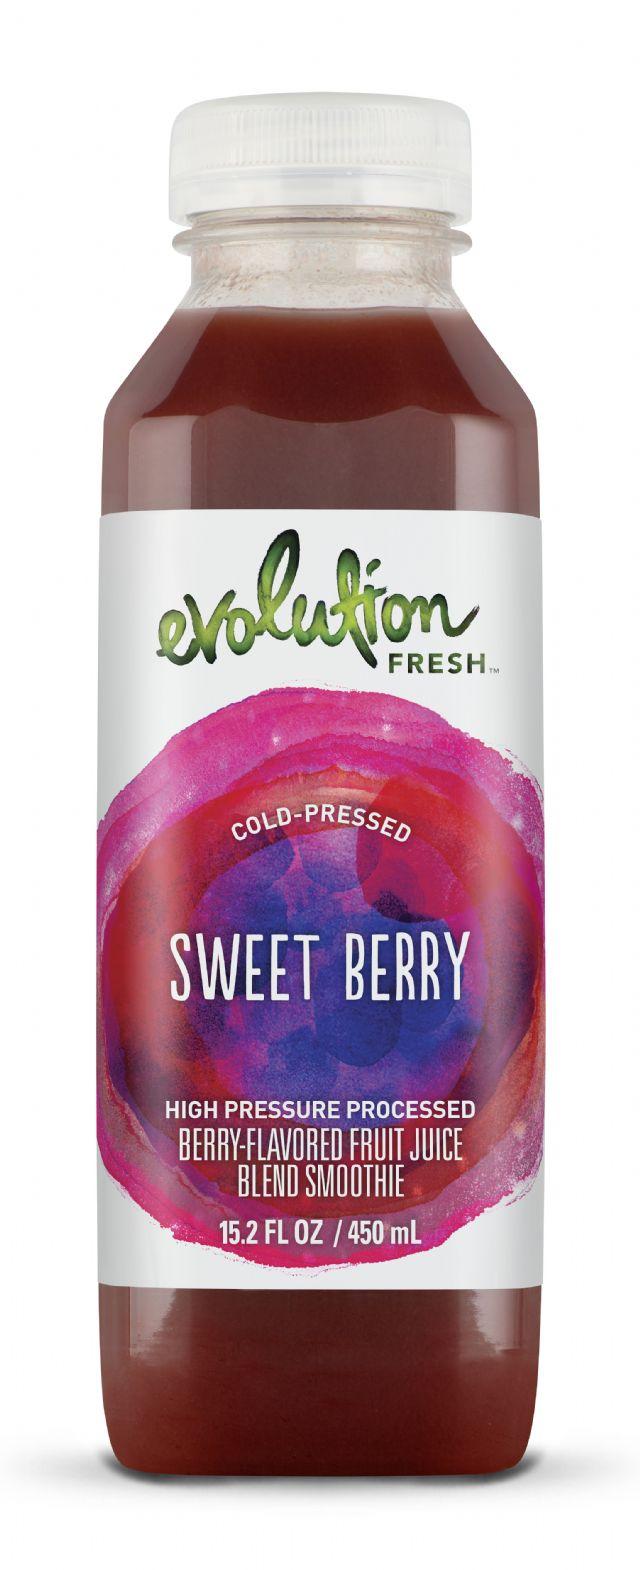 Evolution Fresh: SweetBerry copy